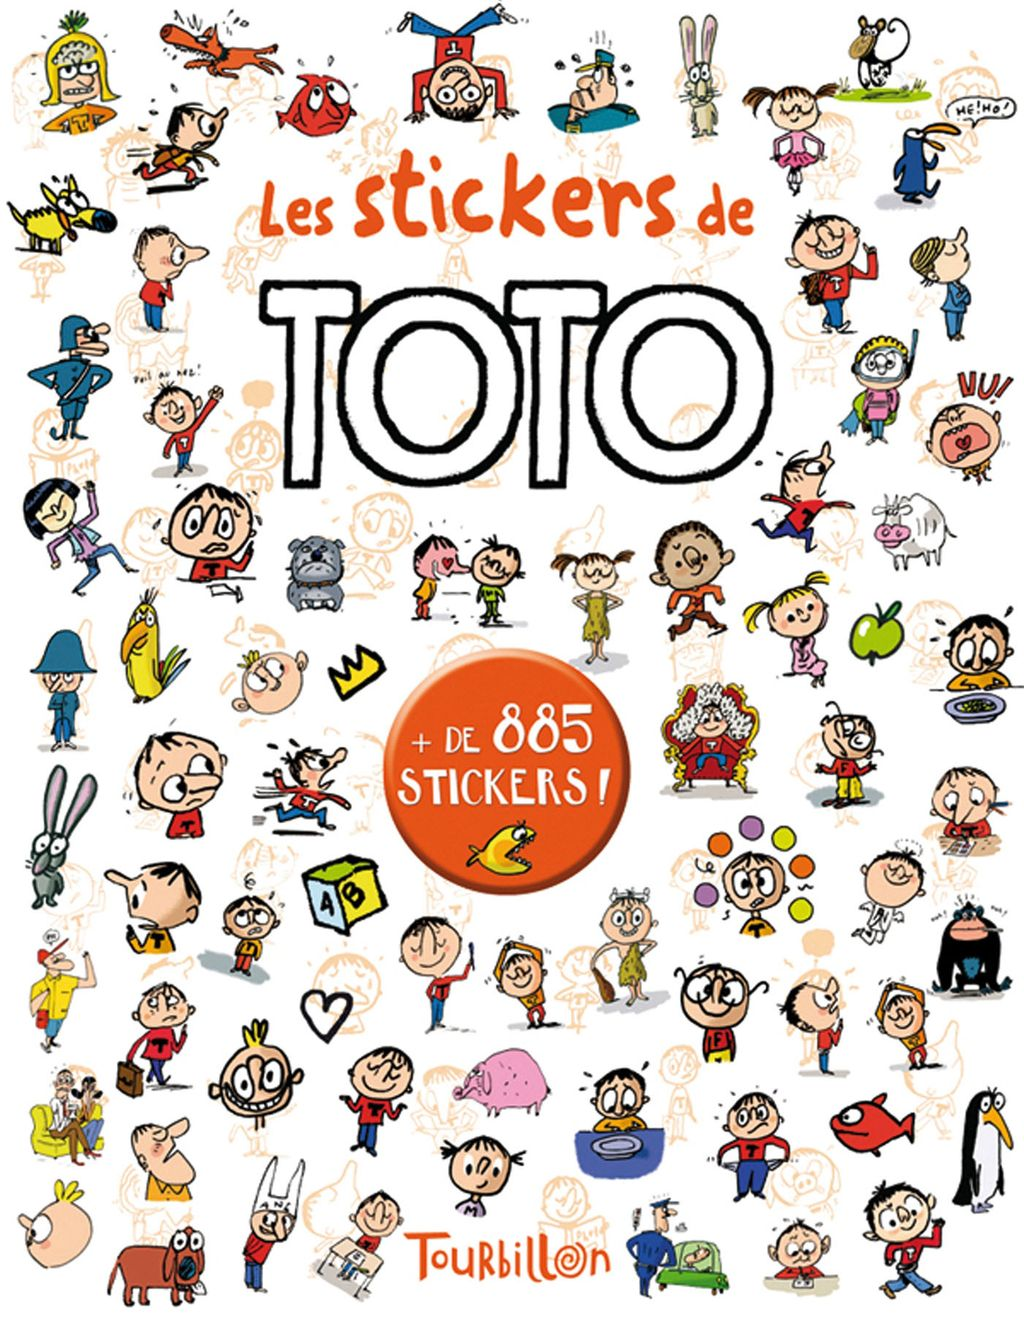 «Les stickers de Toto» cover